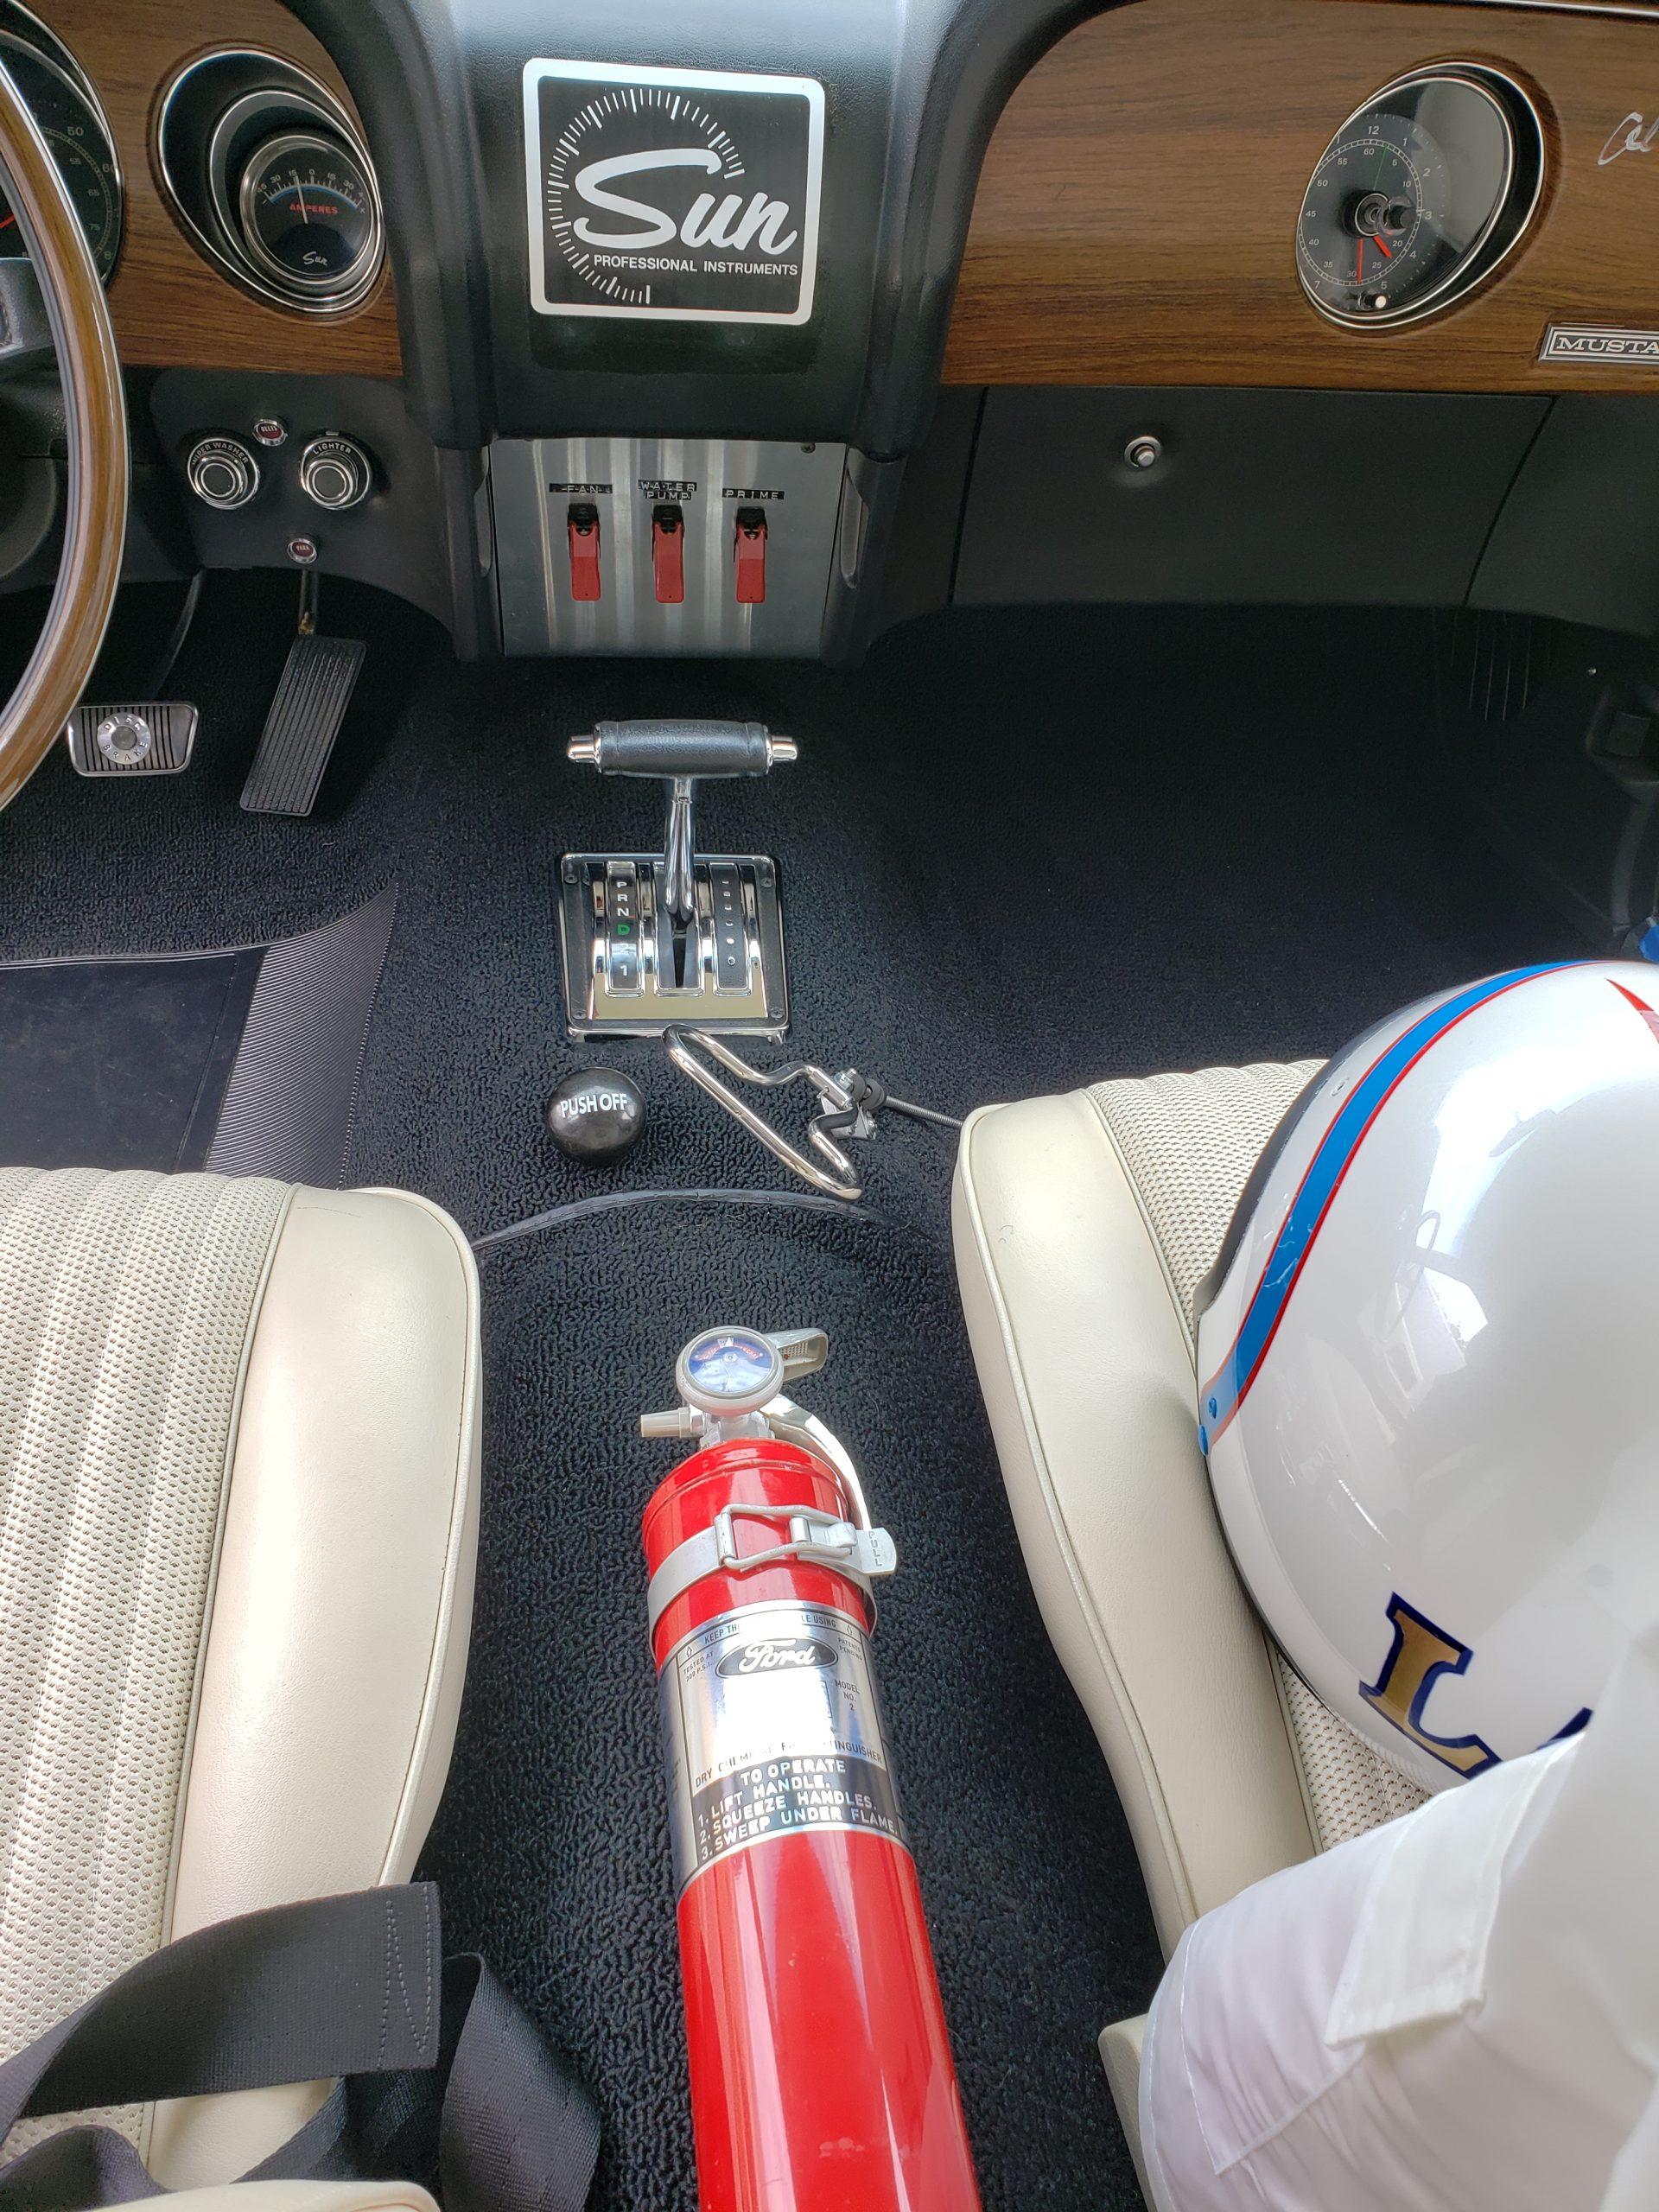 Lawman Boss 429 Ford Mustang restoration interior center shifter ridge extinguisher